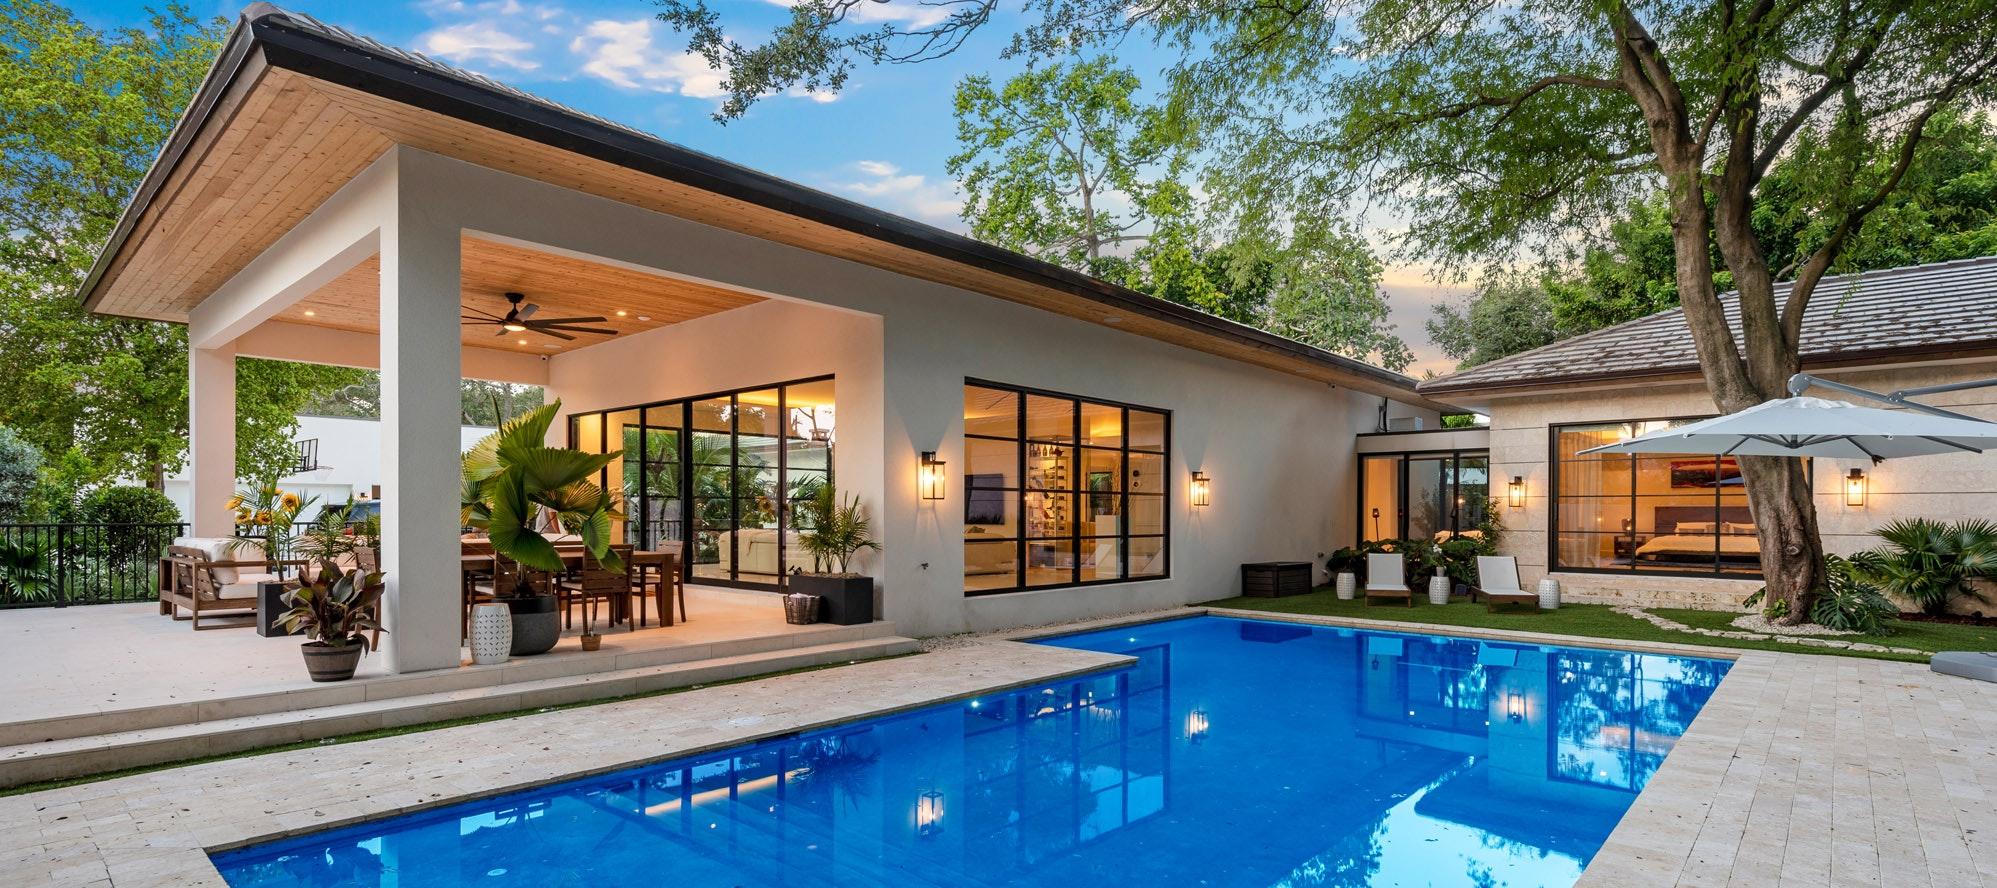 Villa Limon luxury rental in Miami Shores